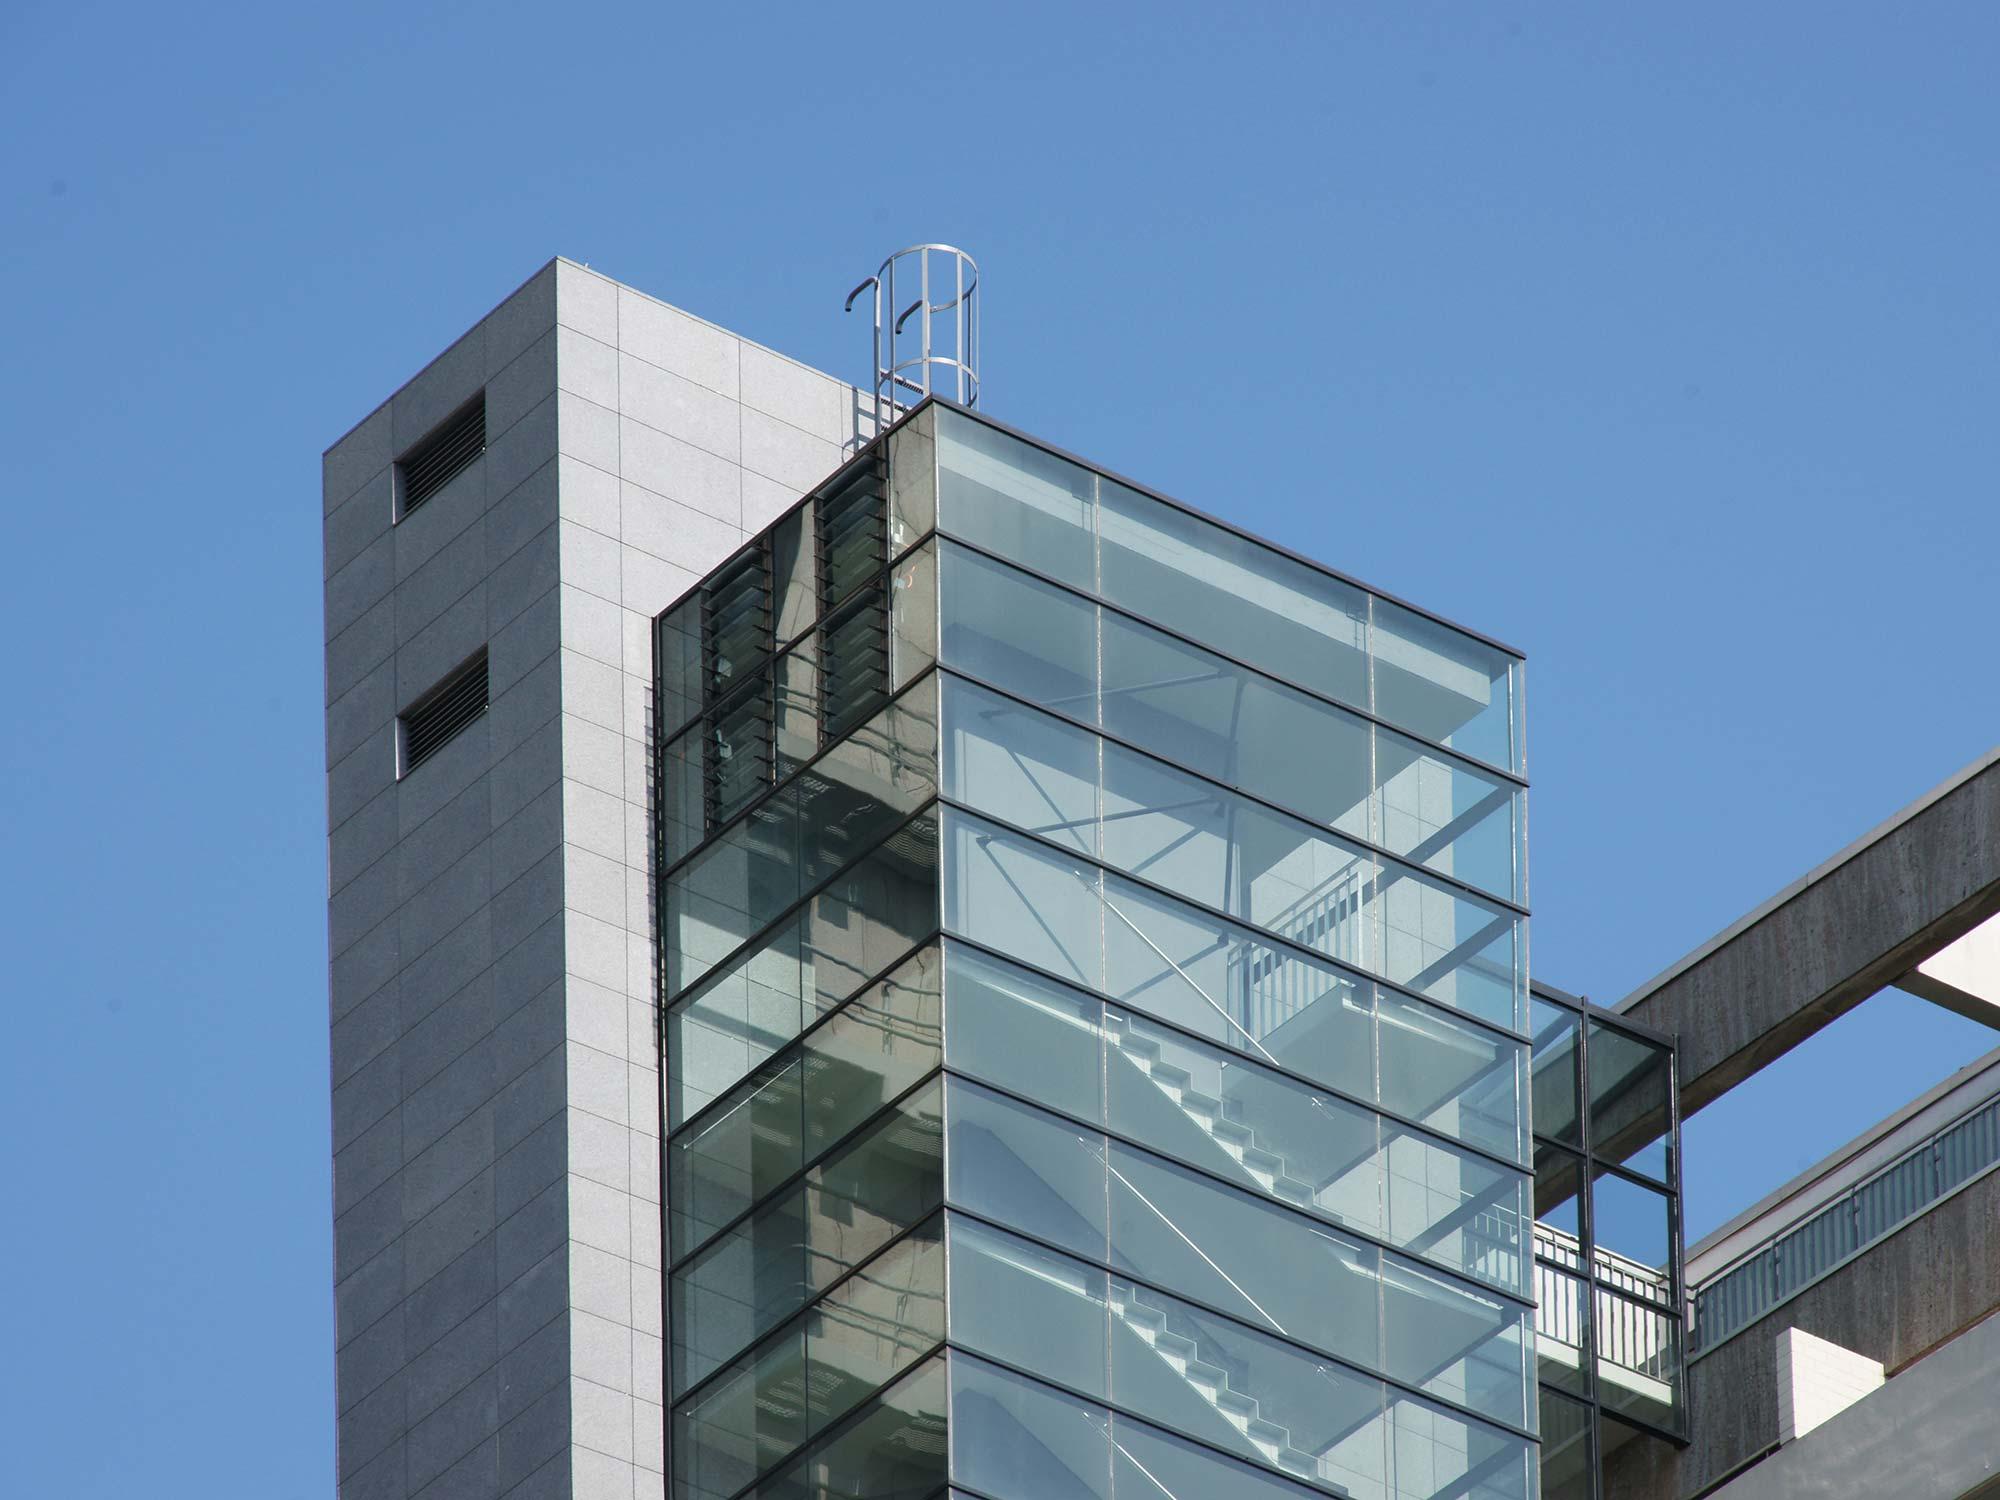 Interconti Frankfurt Hotel - Aufzugsturm und Treppenhaus Turm - gebaut 2009